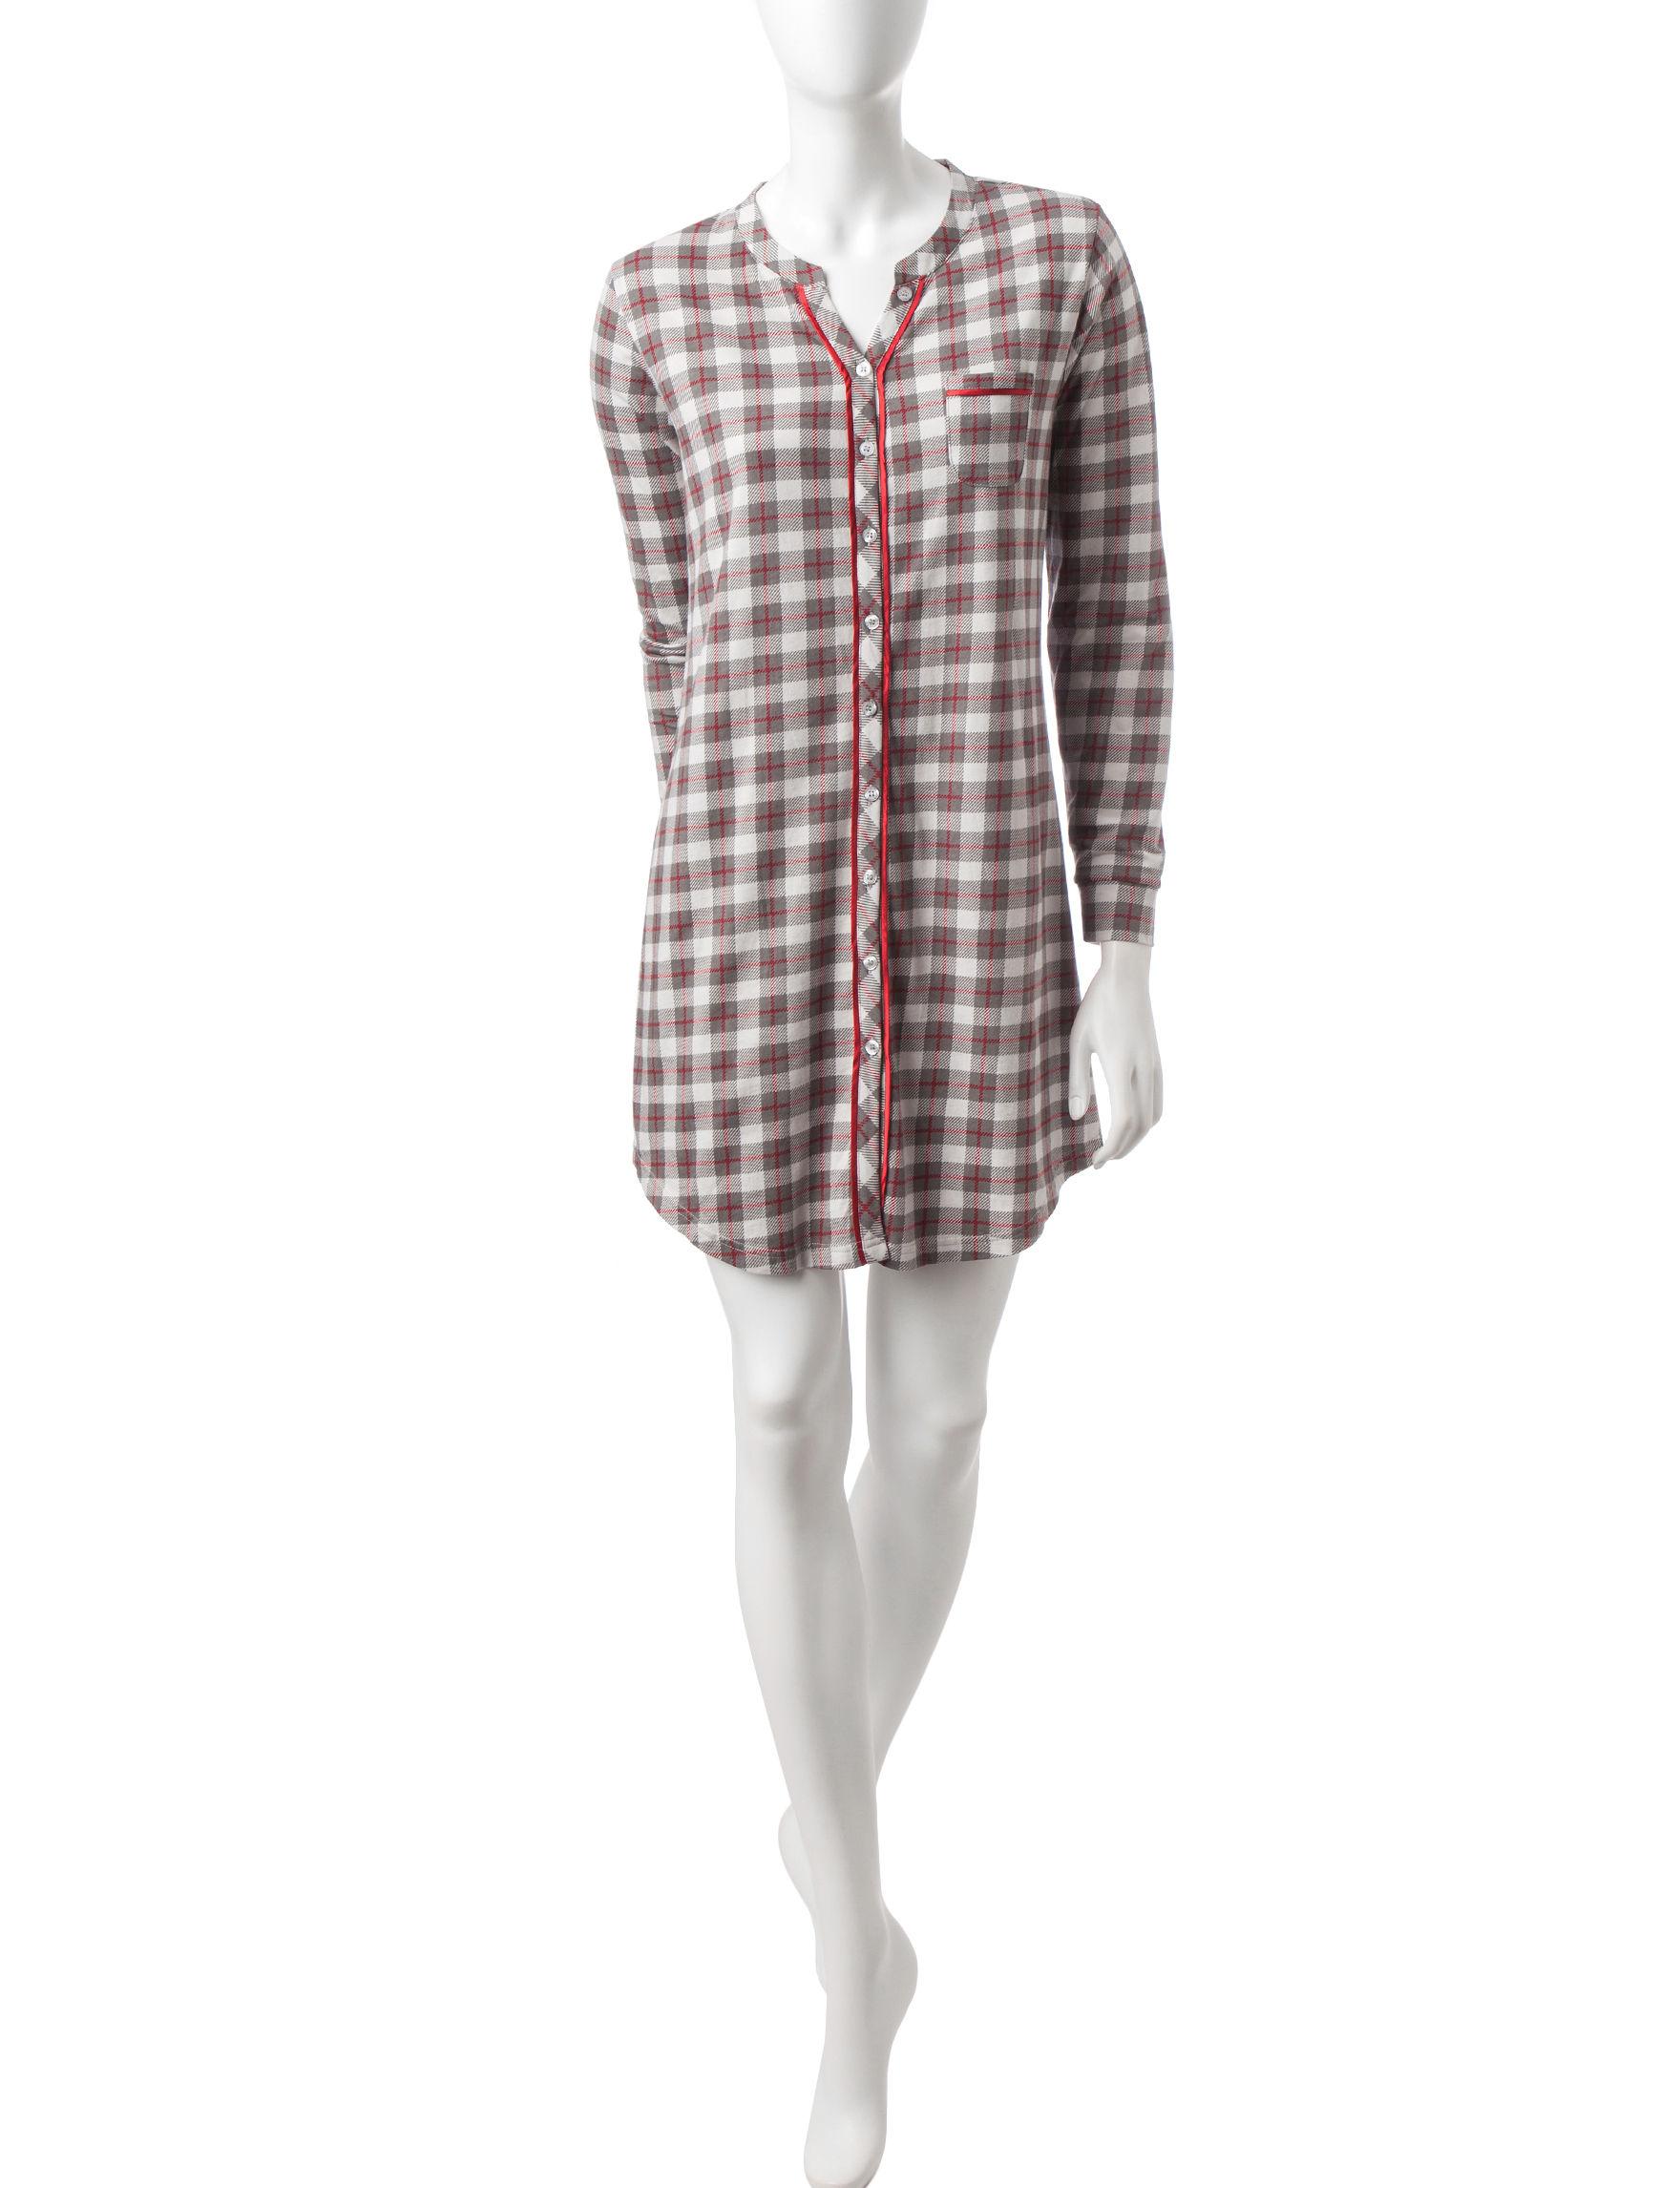 Hanes Grey Plaid Nightgowns & Sleep Shirts